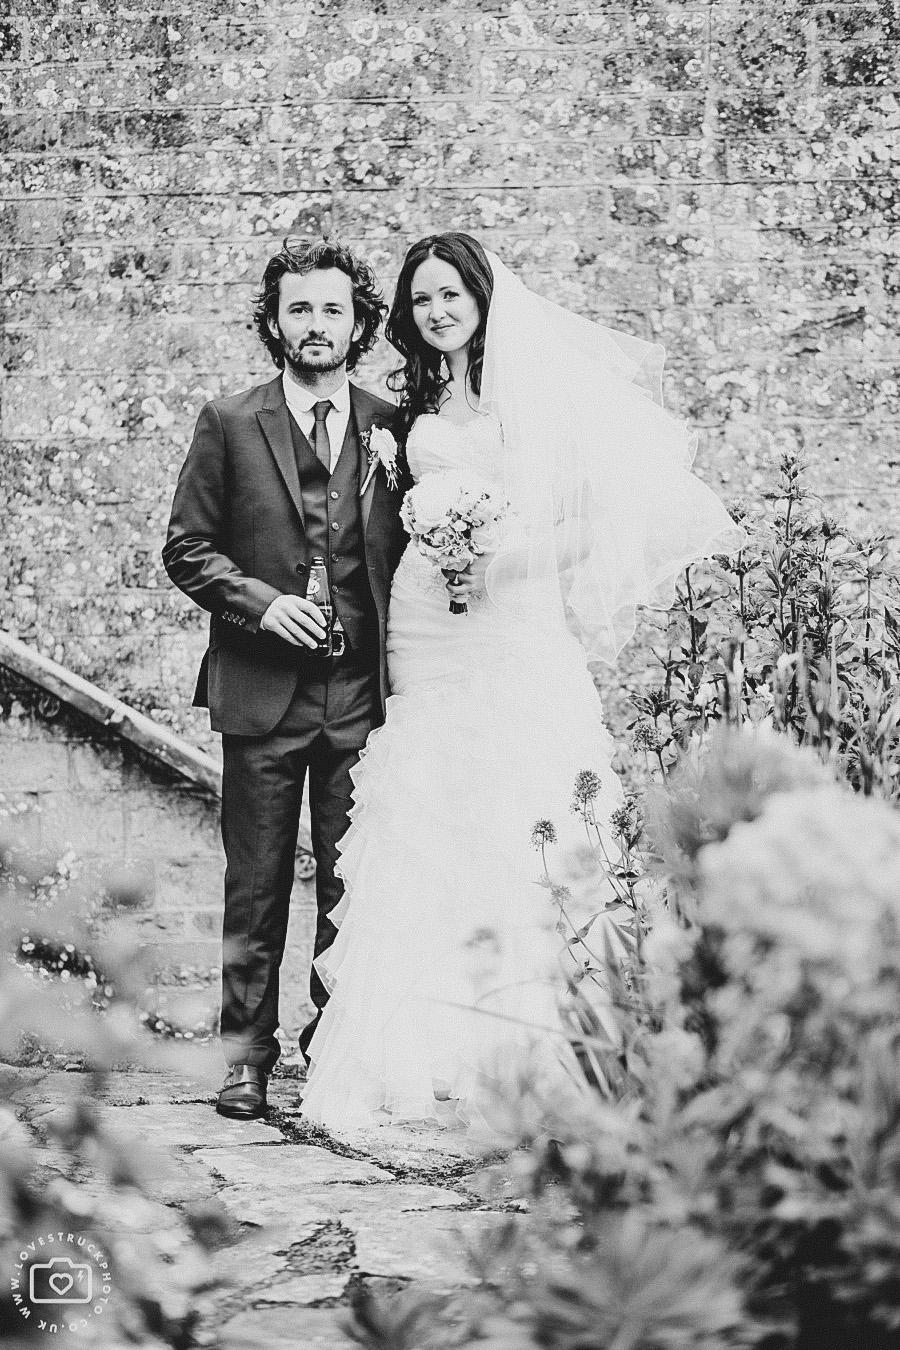 Symondsbury Manor wedding photography, dorset wedding photographer, quirky wedding photography